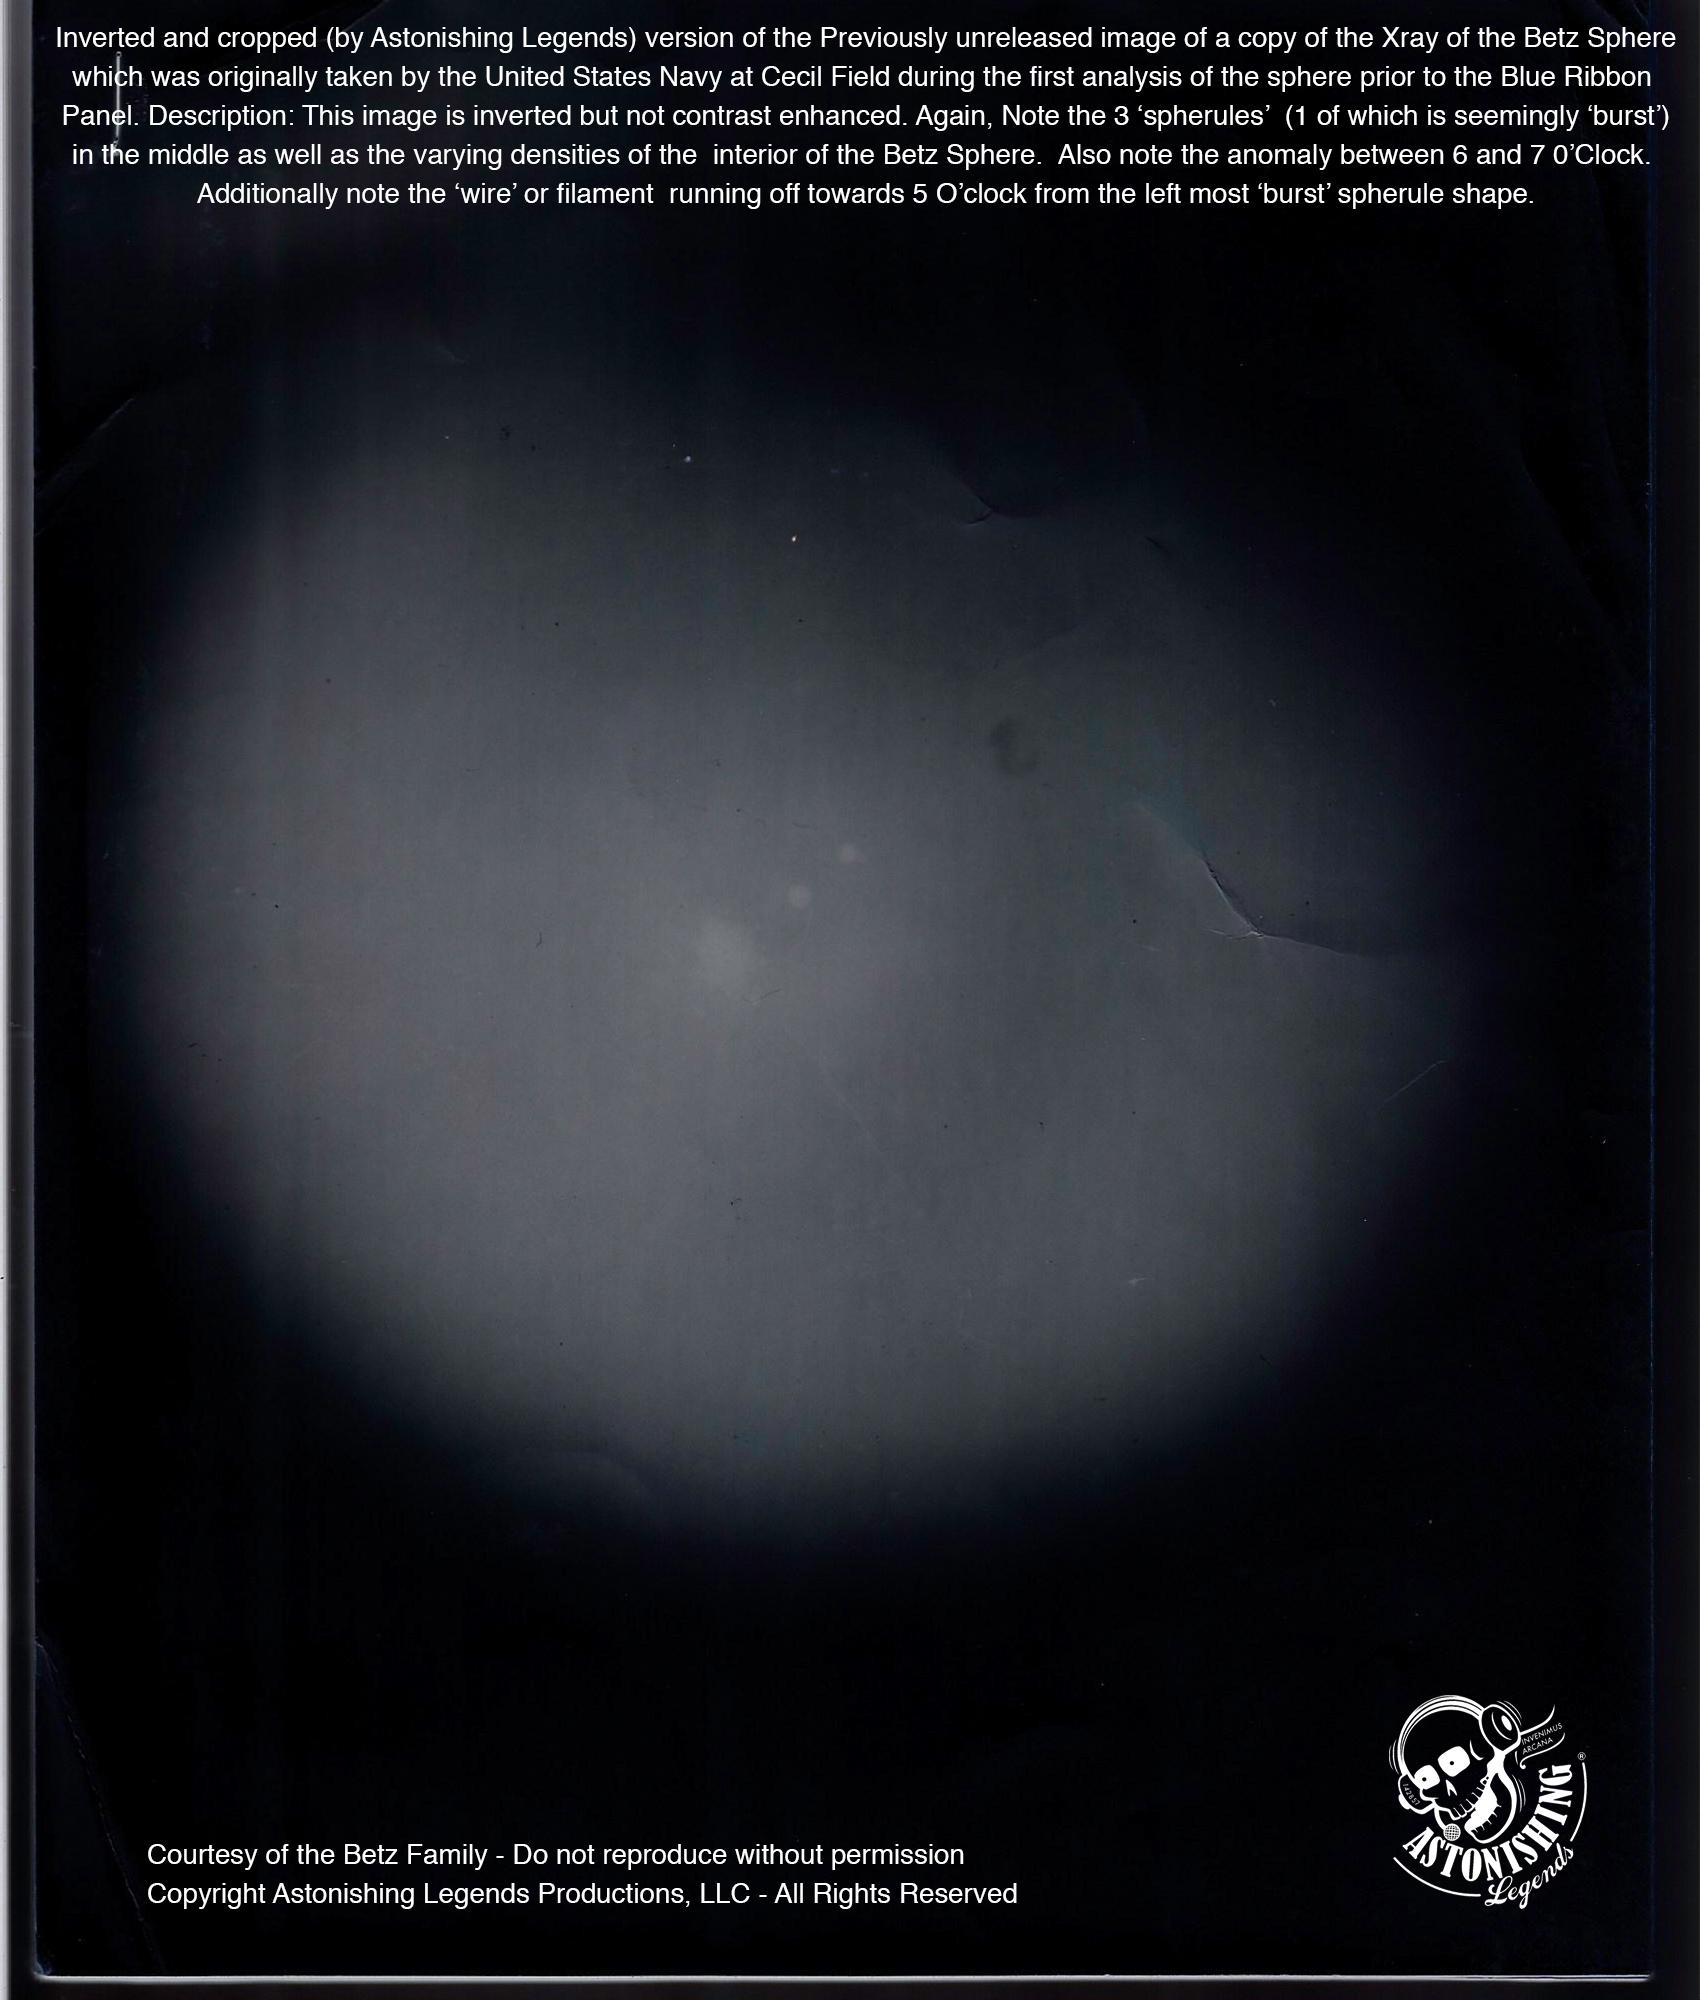 BETZ SPHERE X-RAY-InvertedNoContrastEnhance.jpg